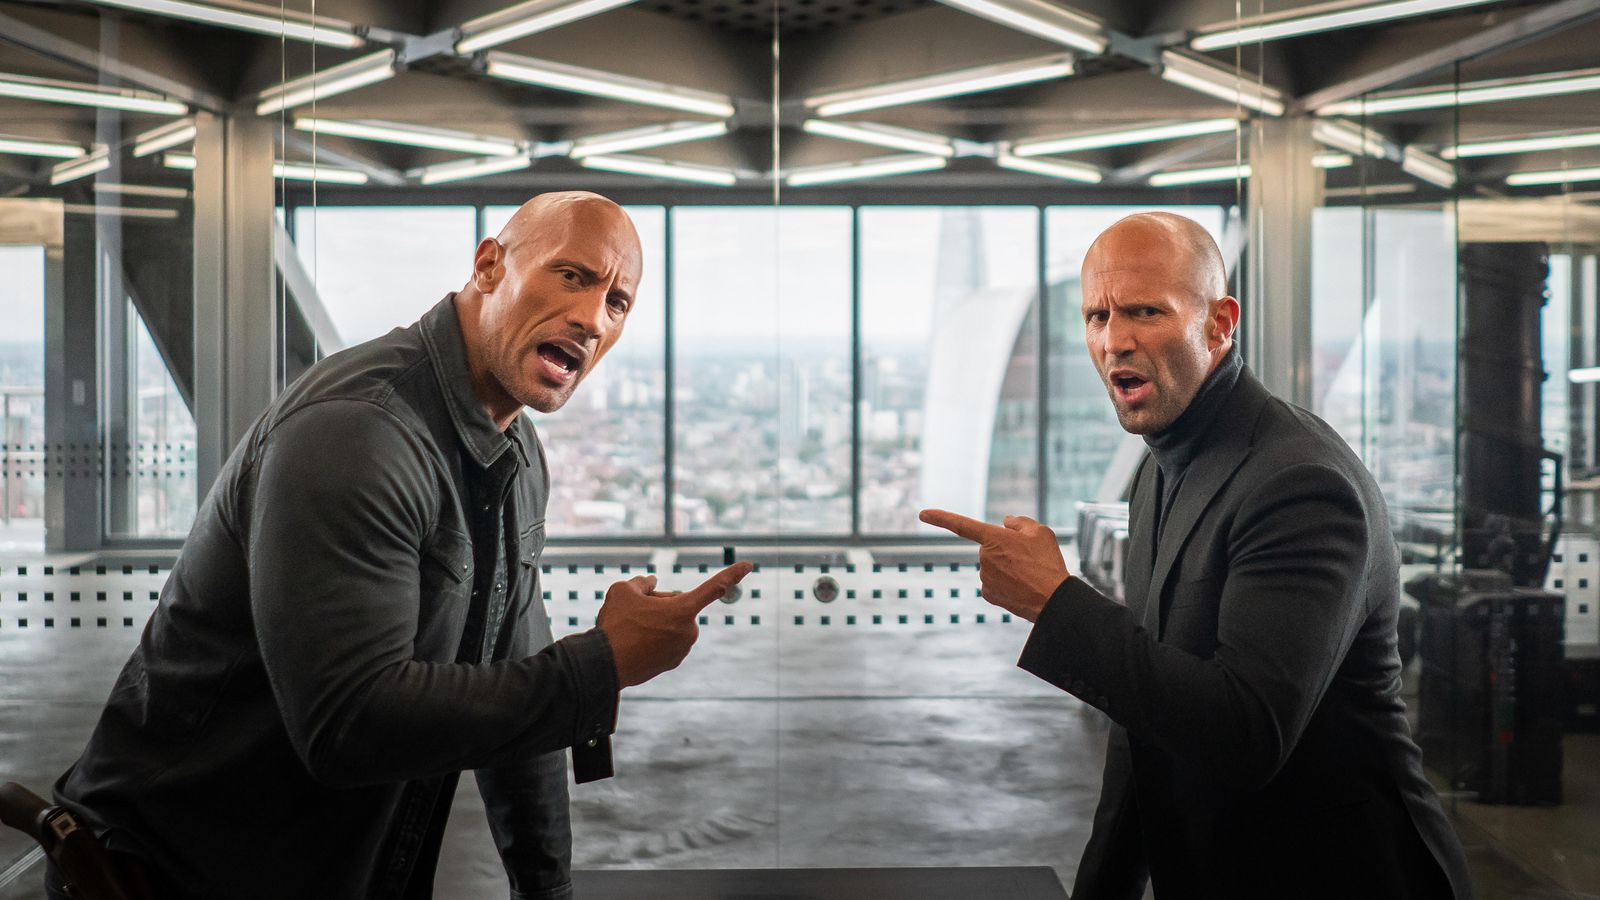 Трейлер: Форсаж: Хоббс и Шоу (Fast & Furious Presents: Hobbs & Shaw)